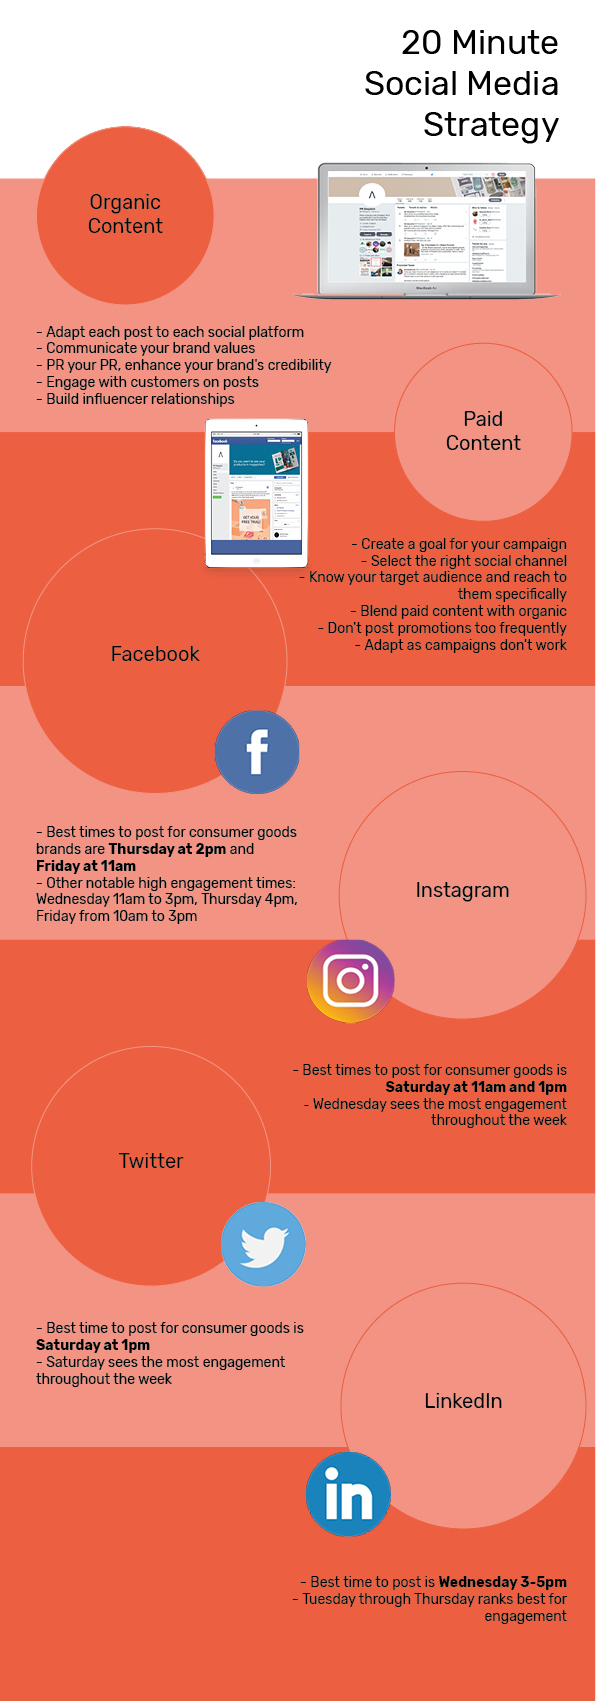 20 minute social media strategy inforgraphic.jpg